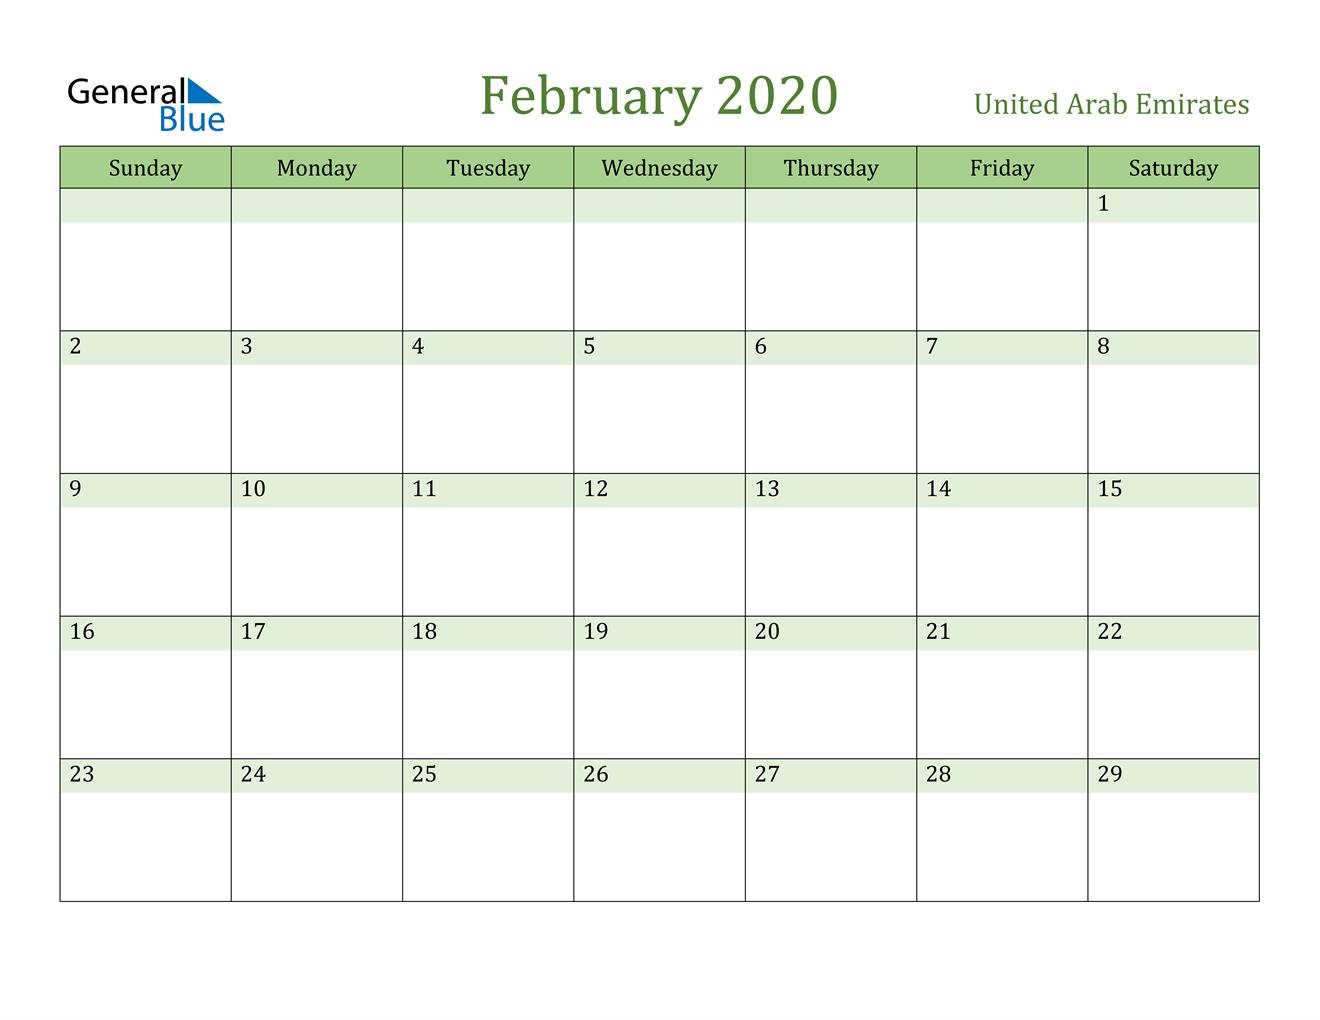 Image of February 2020 Cool and Relaxing Green Calendar Calendar